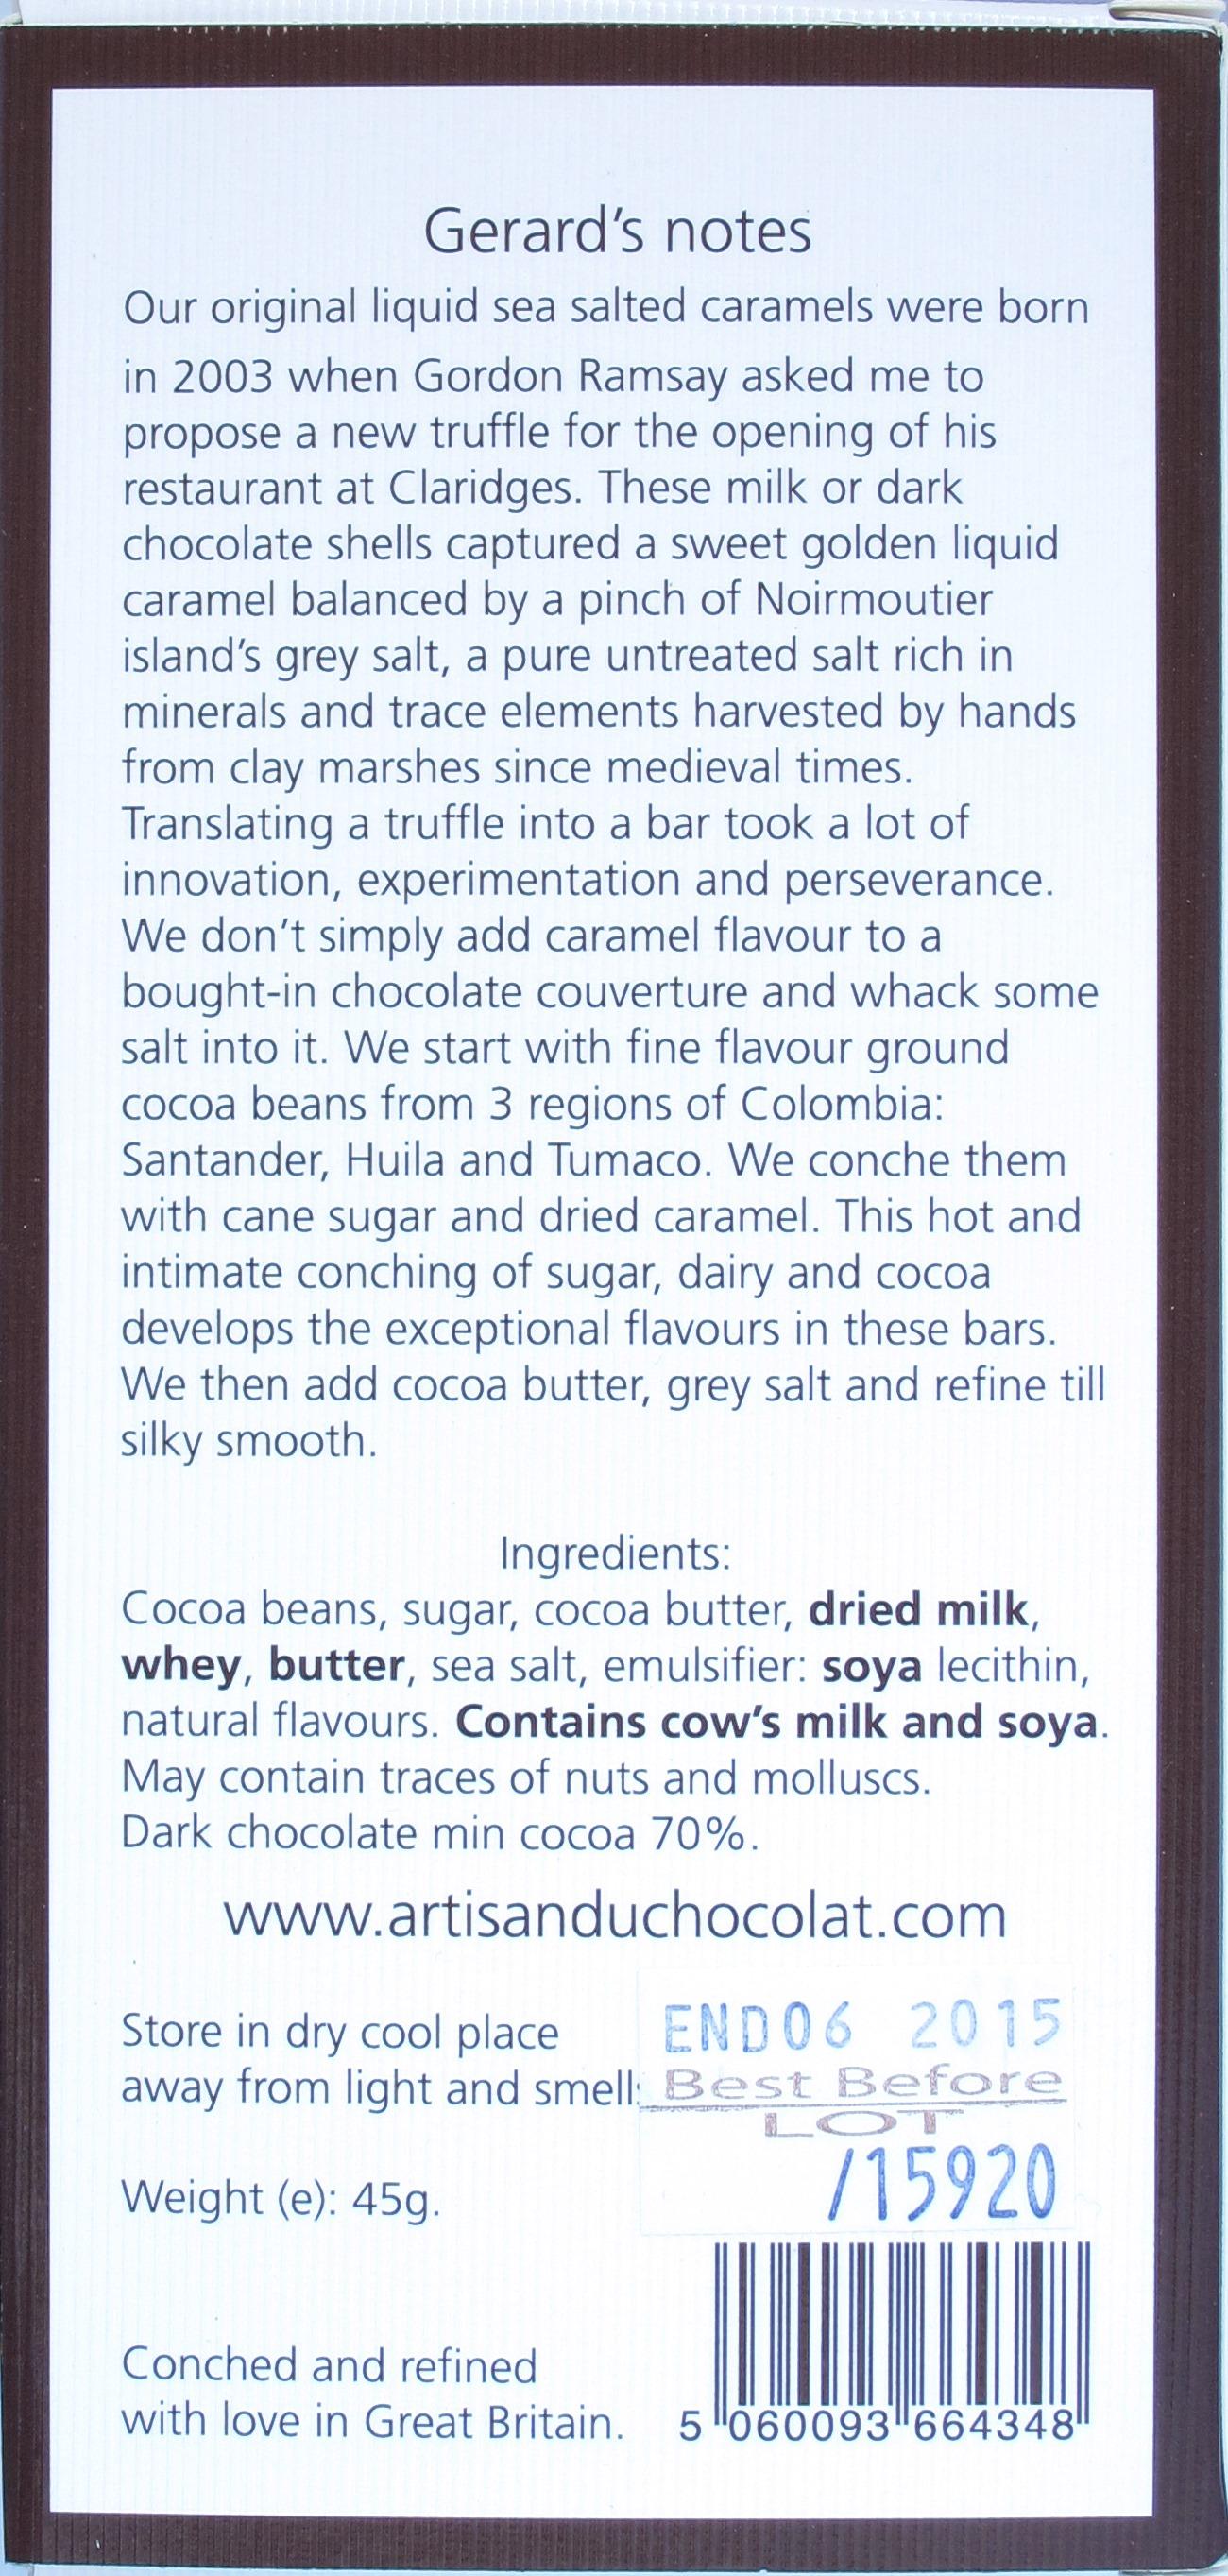 Artisan du Chocolat 70% Karamellsalzschokolade, Rückseite